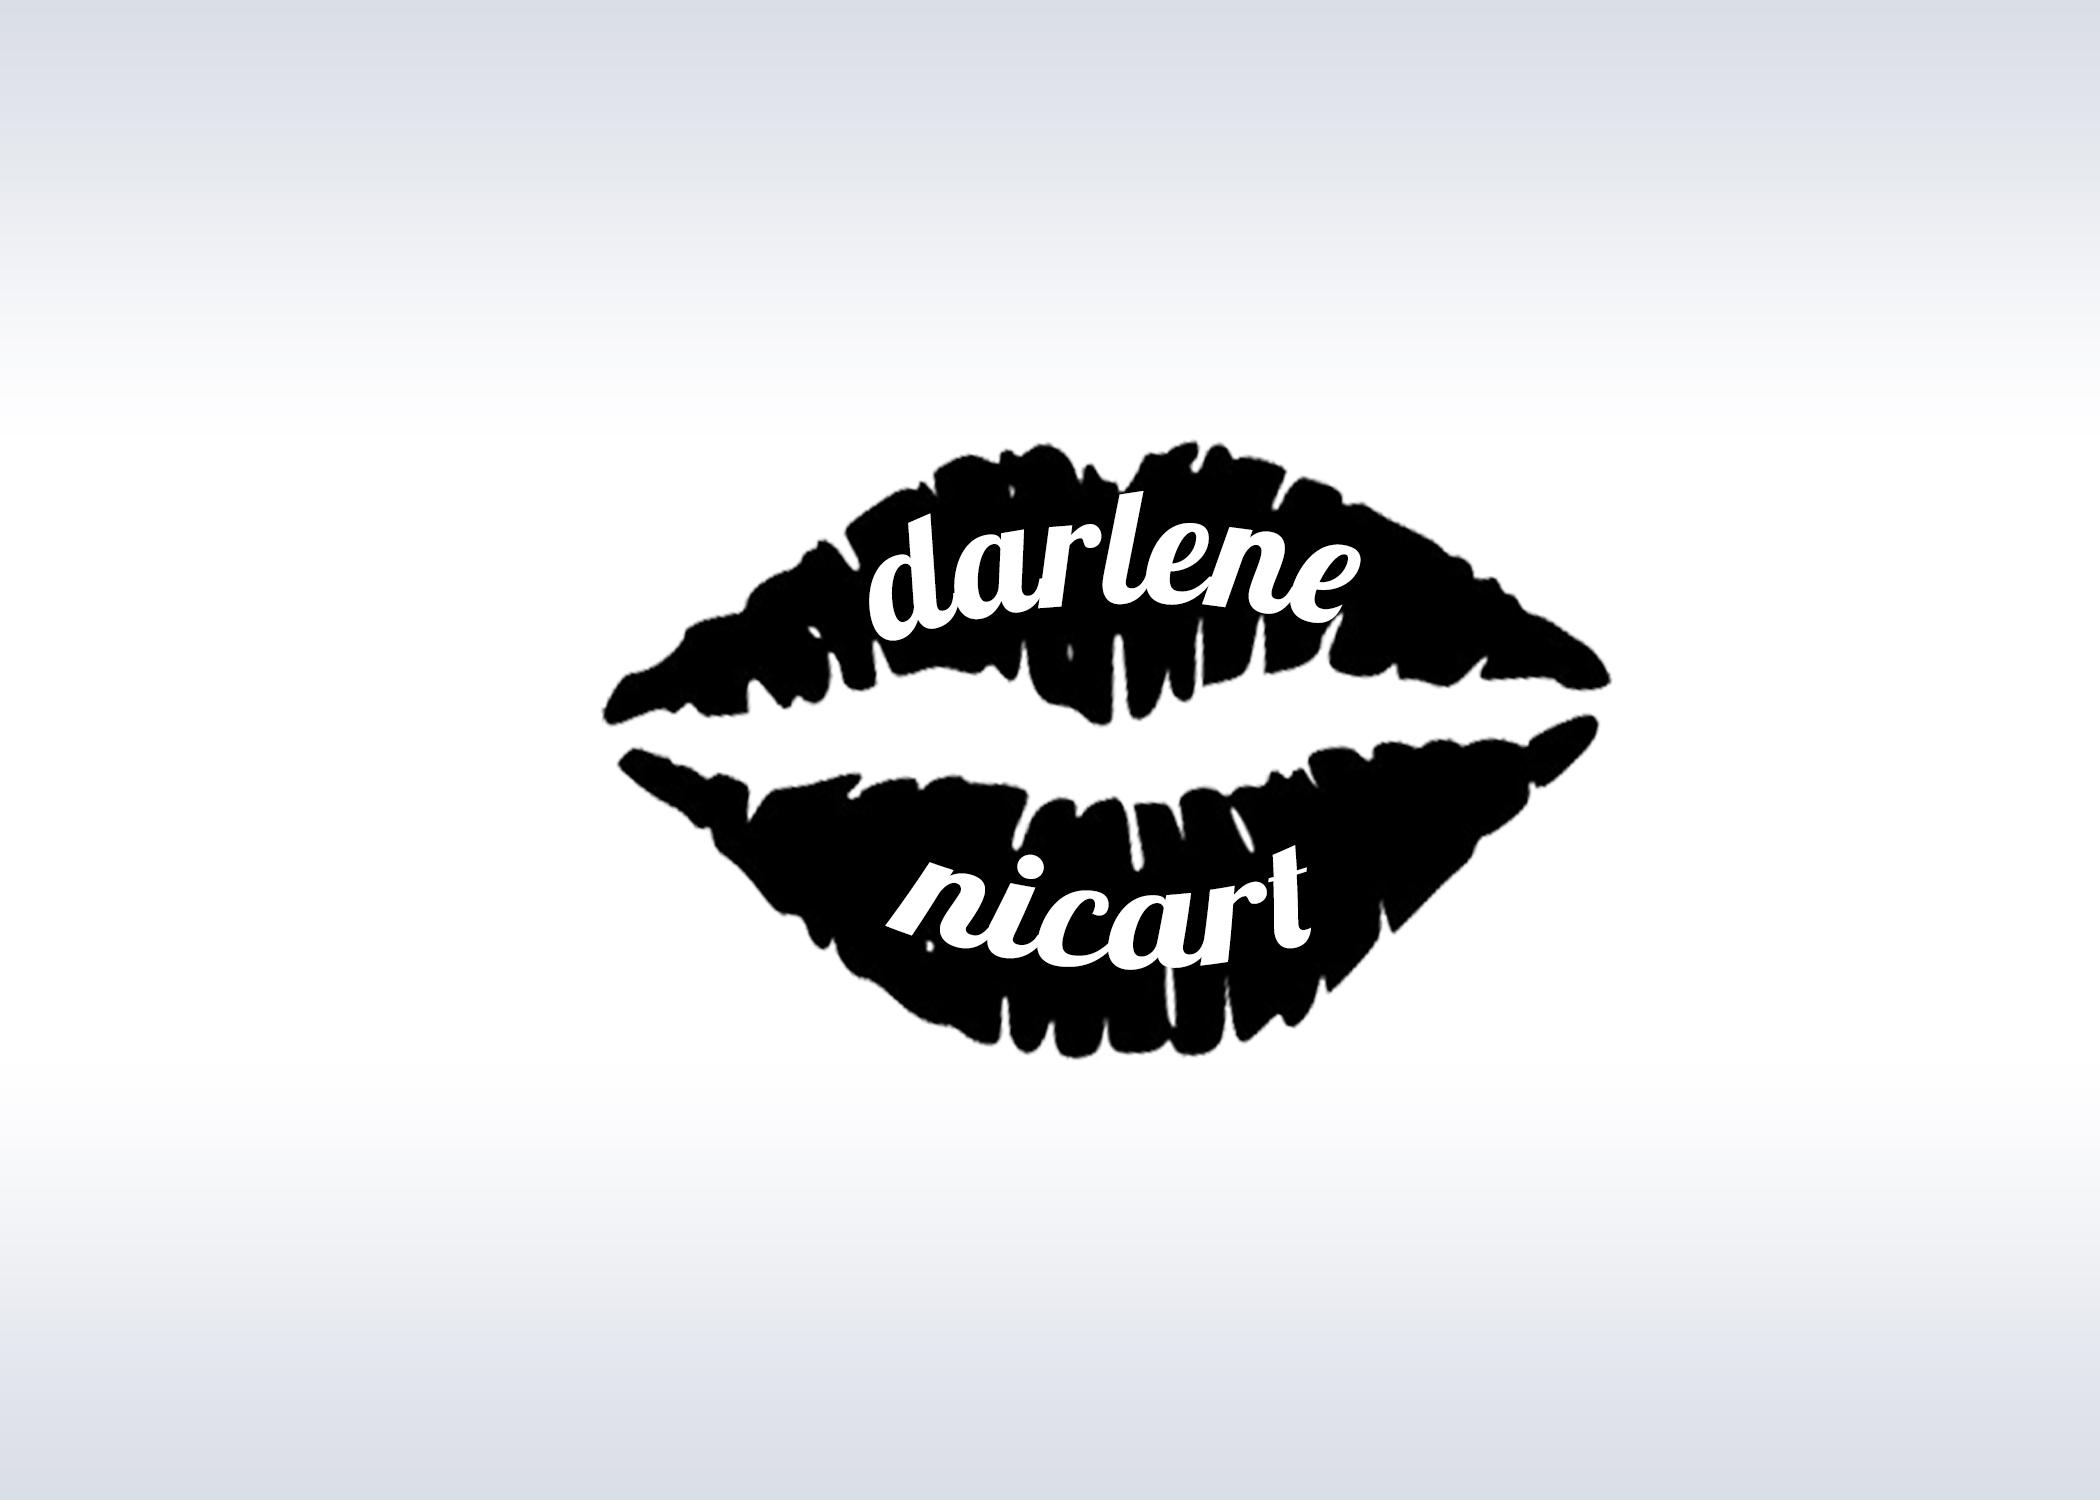 Darlene Nicart's Signature